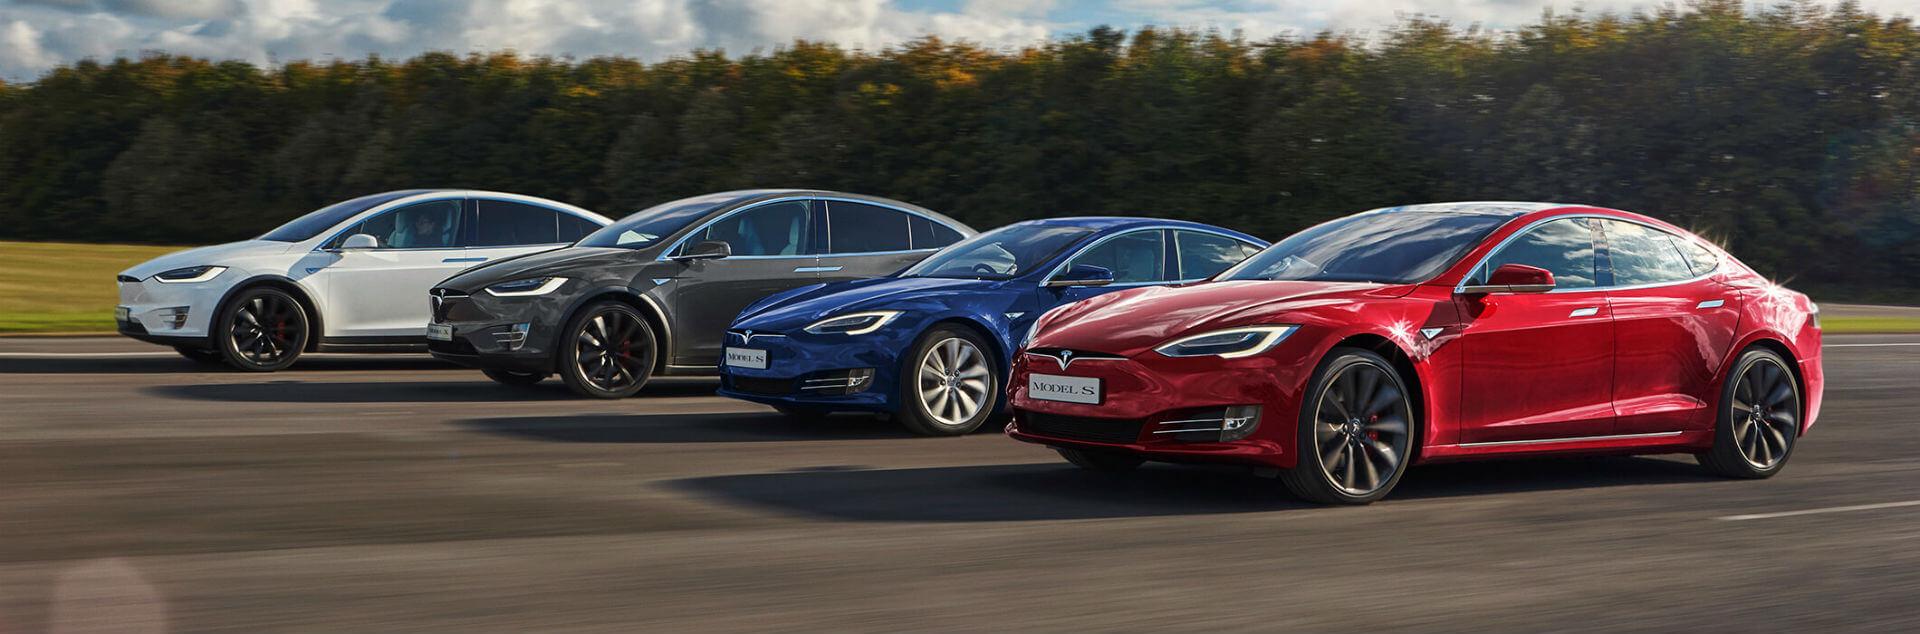 Электромобили Tesla Model X и Model S